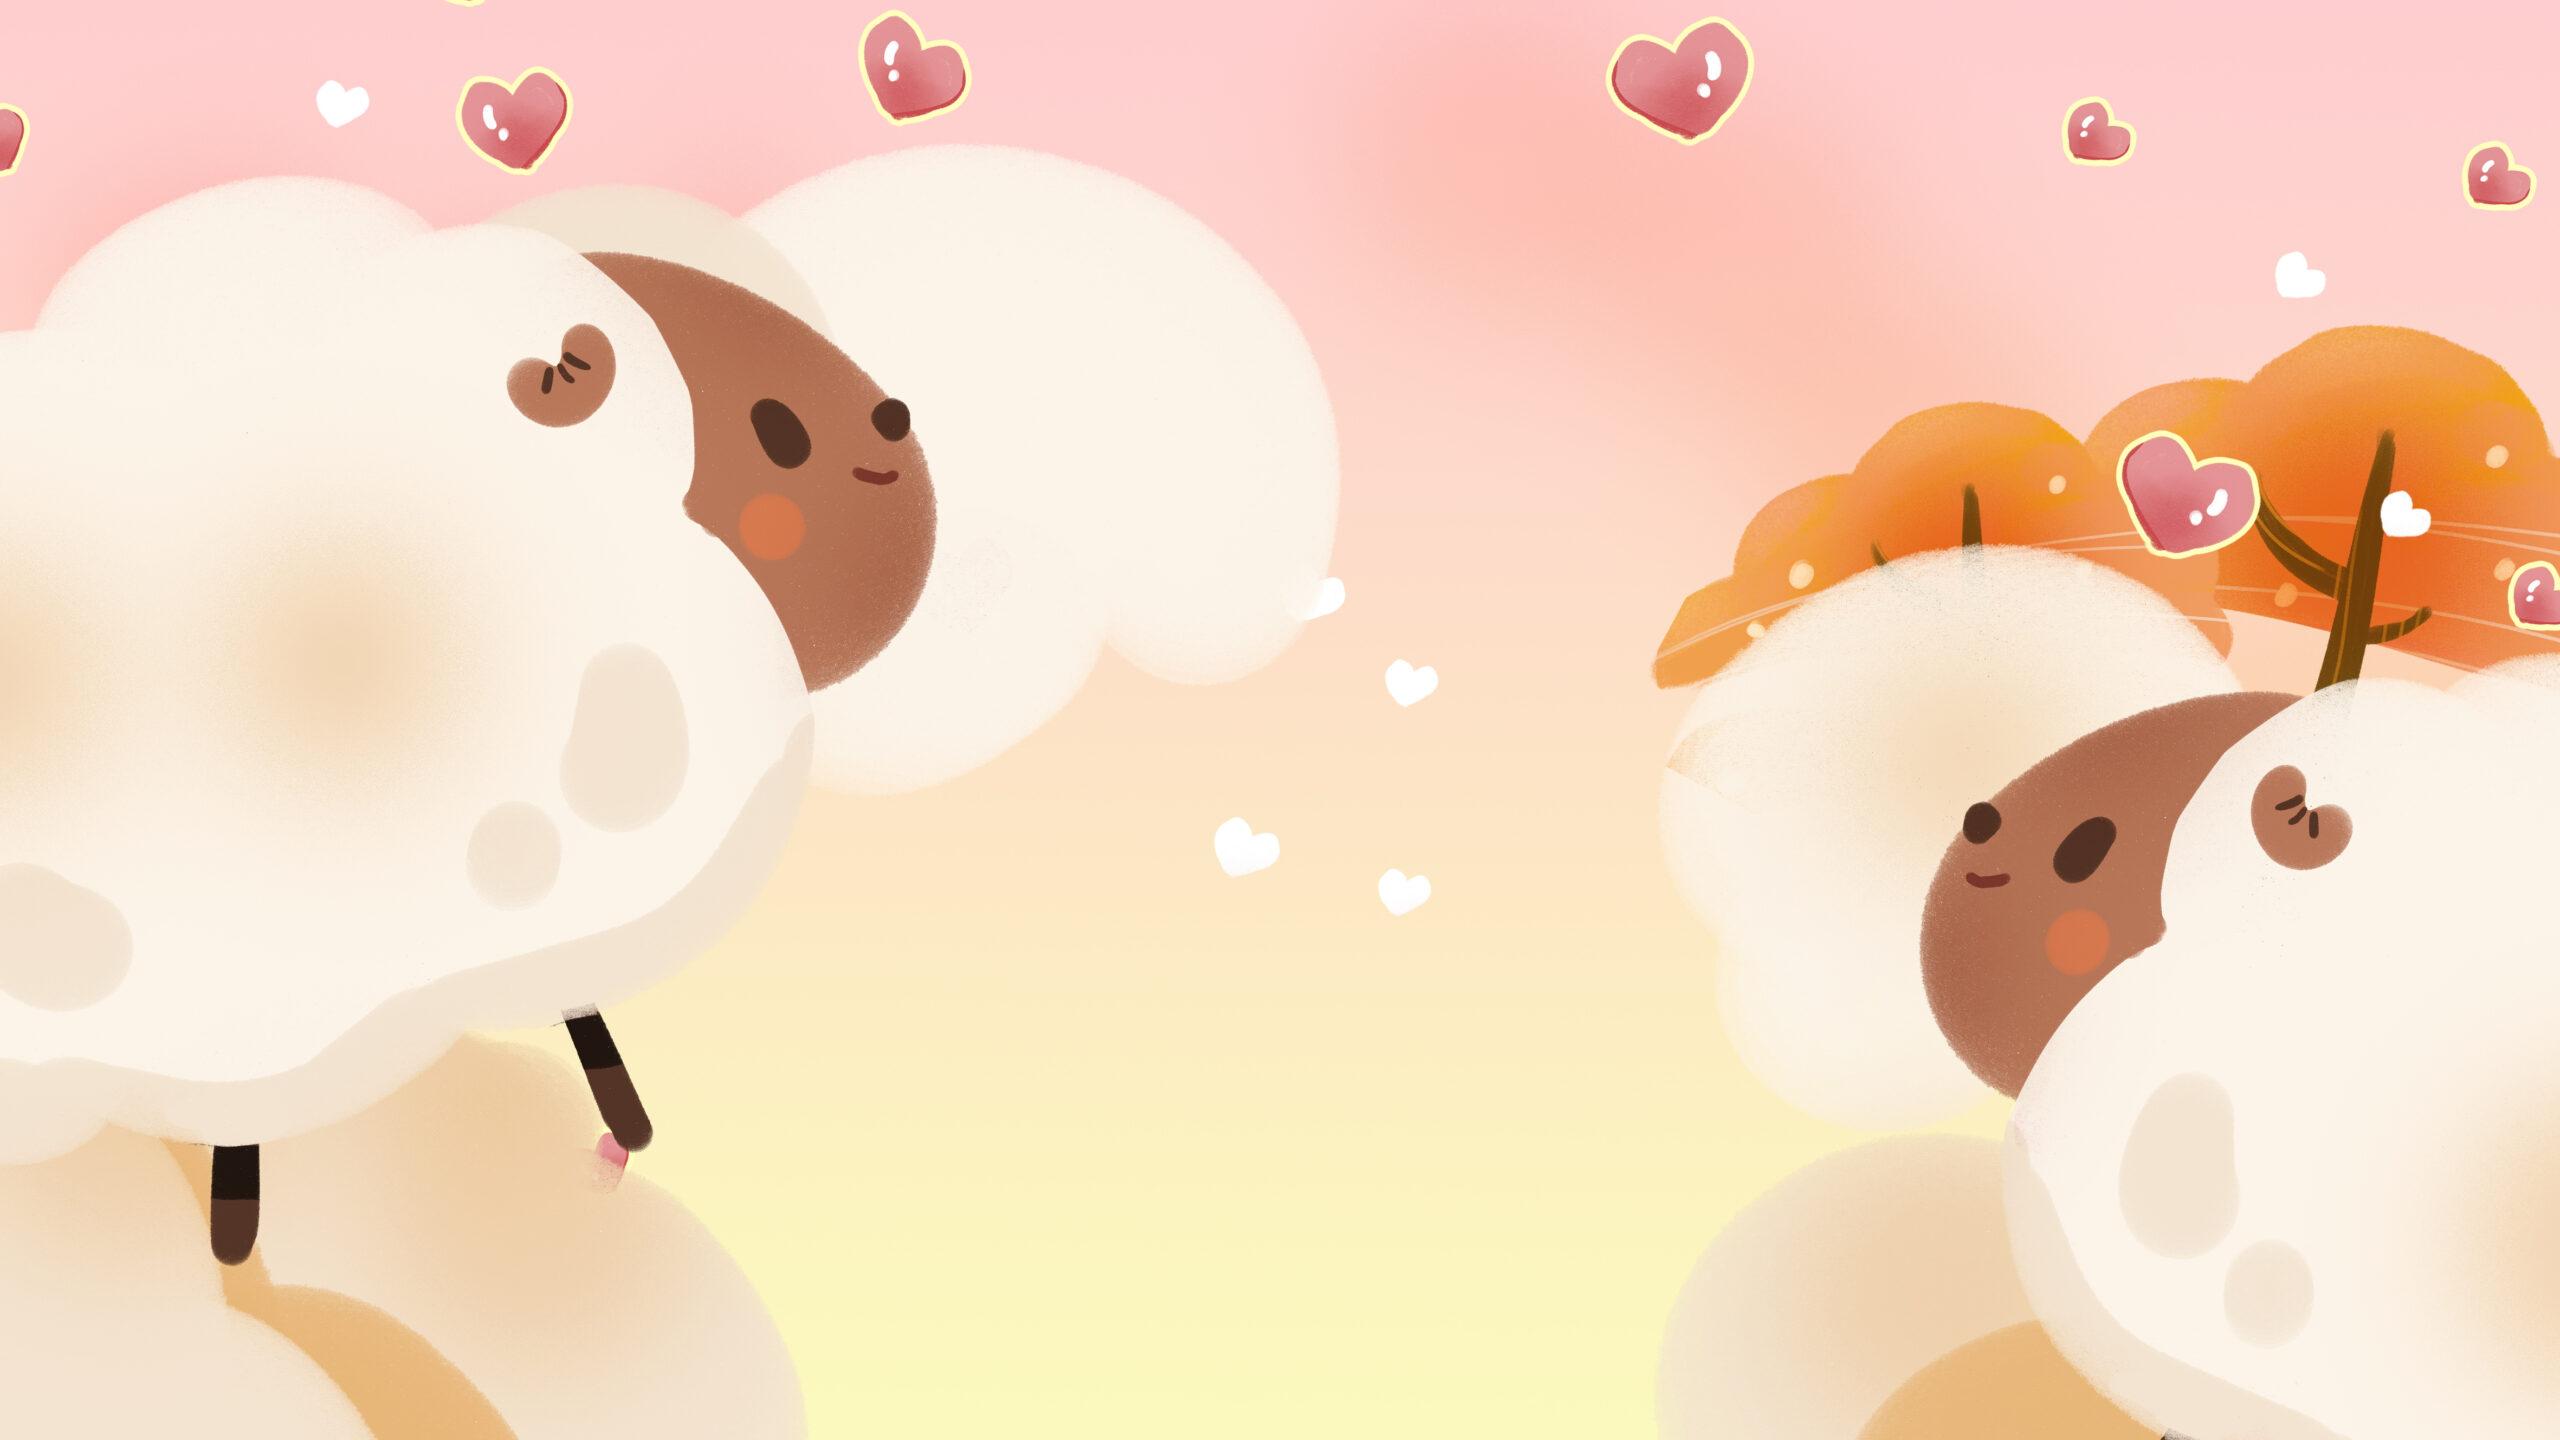 Gambar Kambing Domba Latar Belakang, Kambing Domba Vektor intended for Gambar Domba Animasi